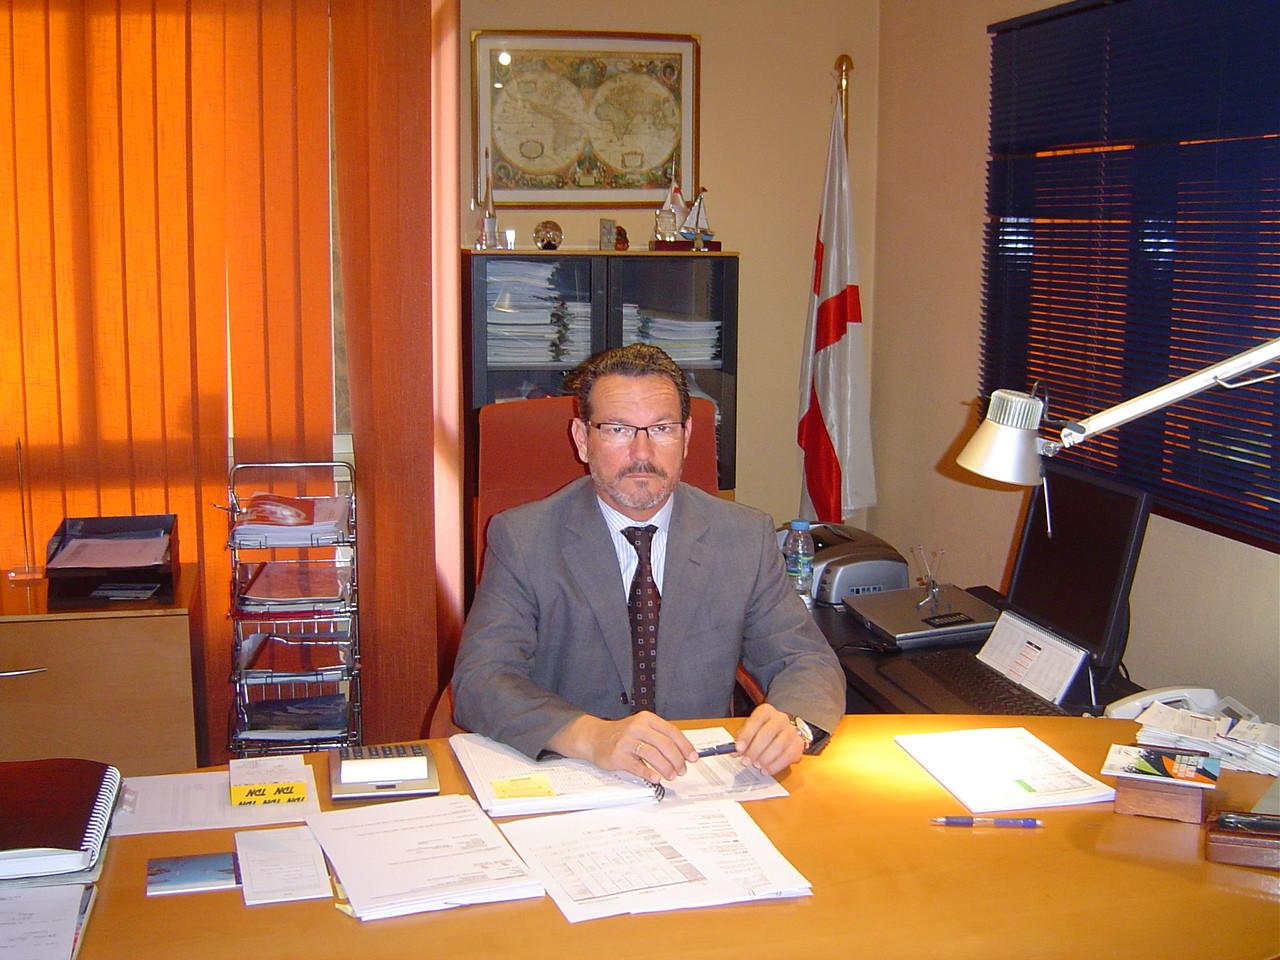 BoludaFelipeLpezPellsdelegadodeBoludaLinesenAlicantePresidenteAsocConsig.Alicante